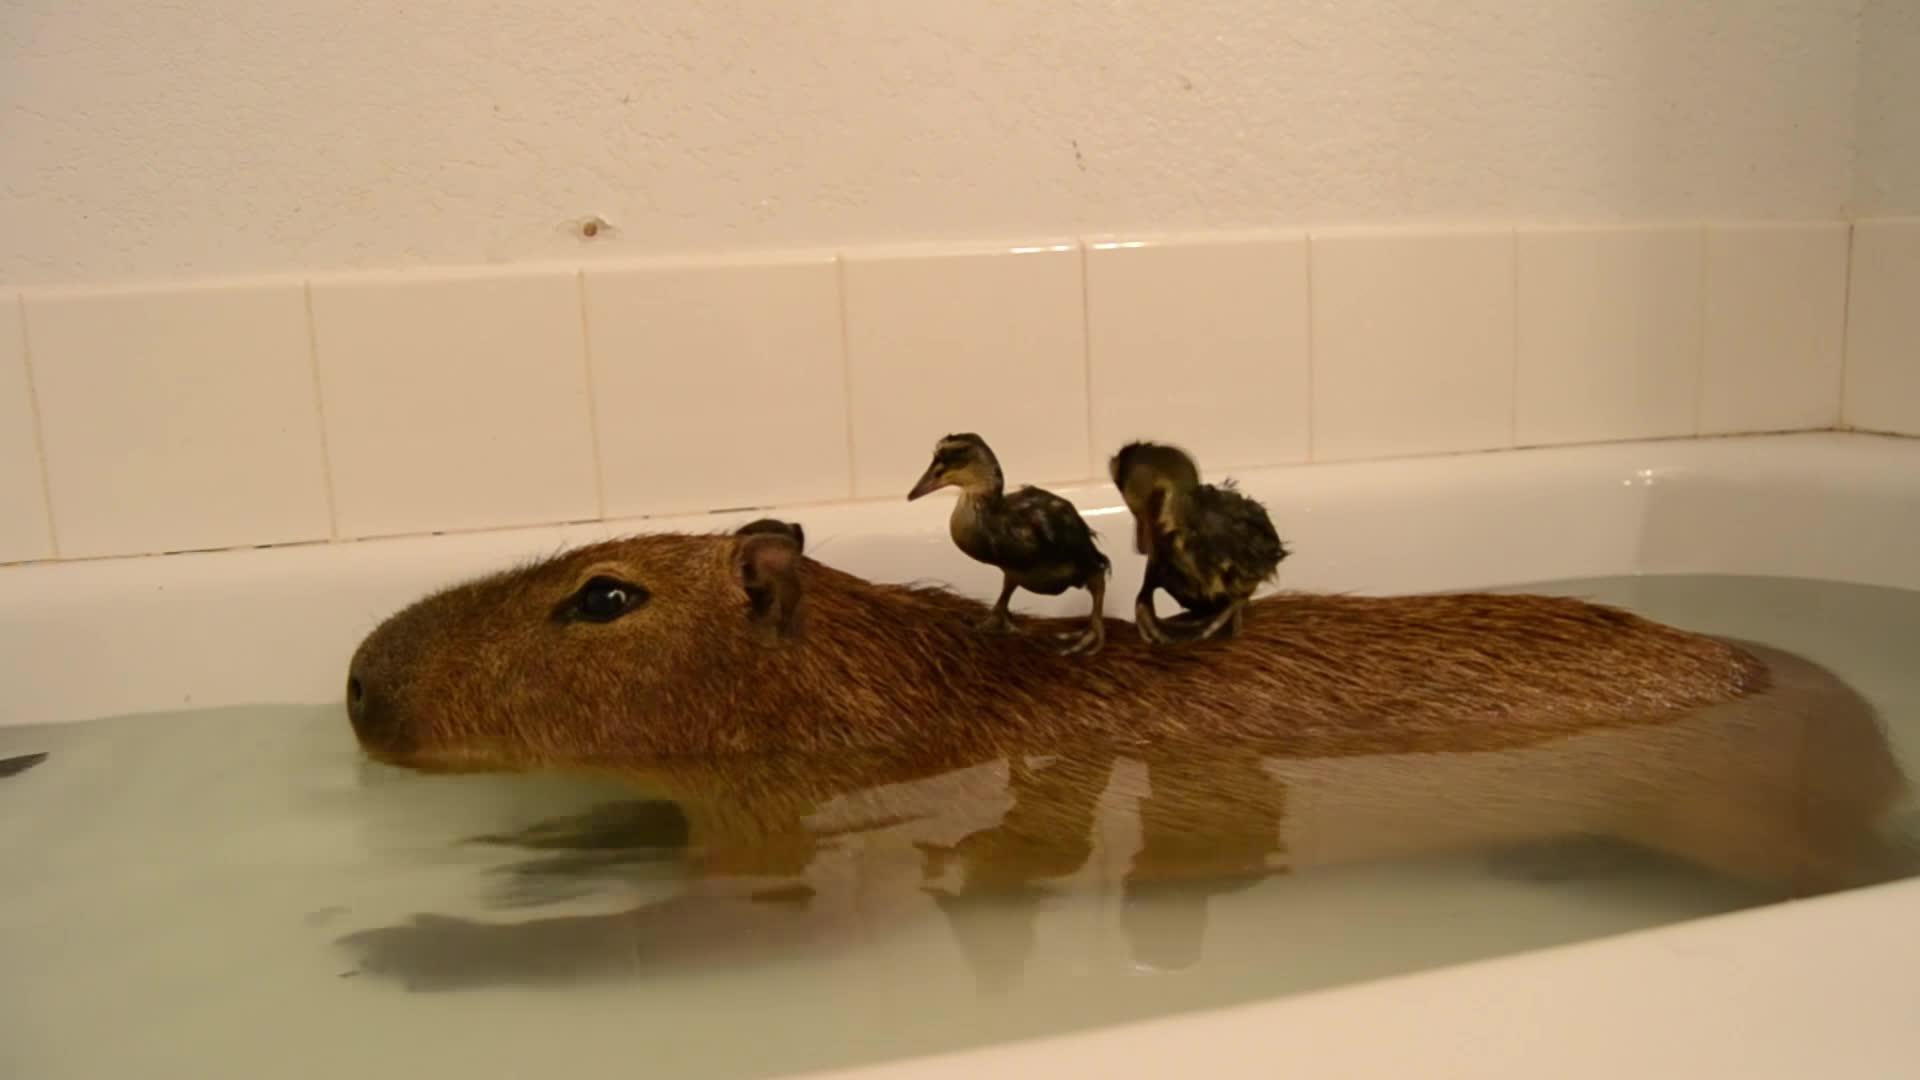 animals, awesome, capybara, crazy cody's creatures, ducks, joejoe the capybara, pets & animals, Capybara Island! GIFs